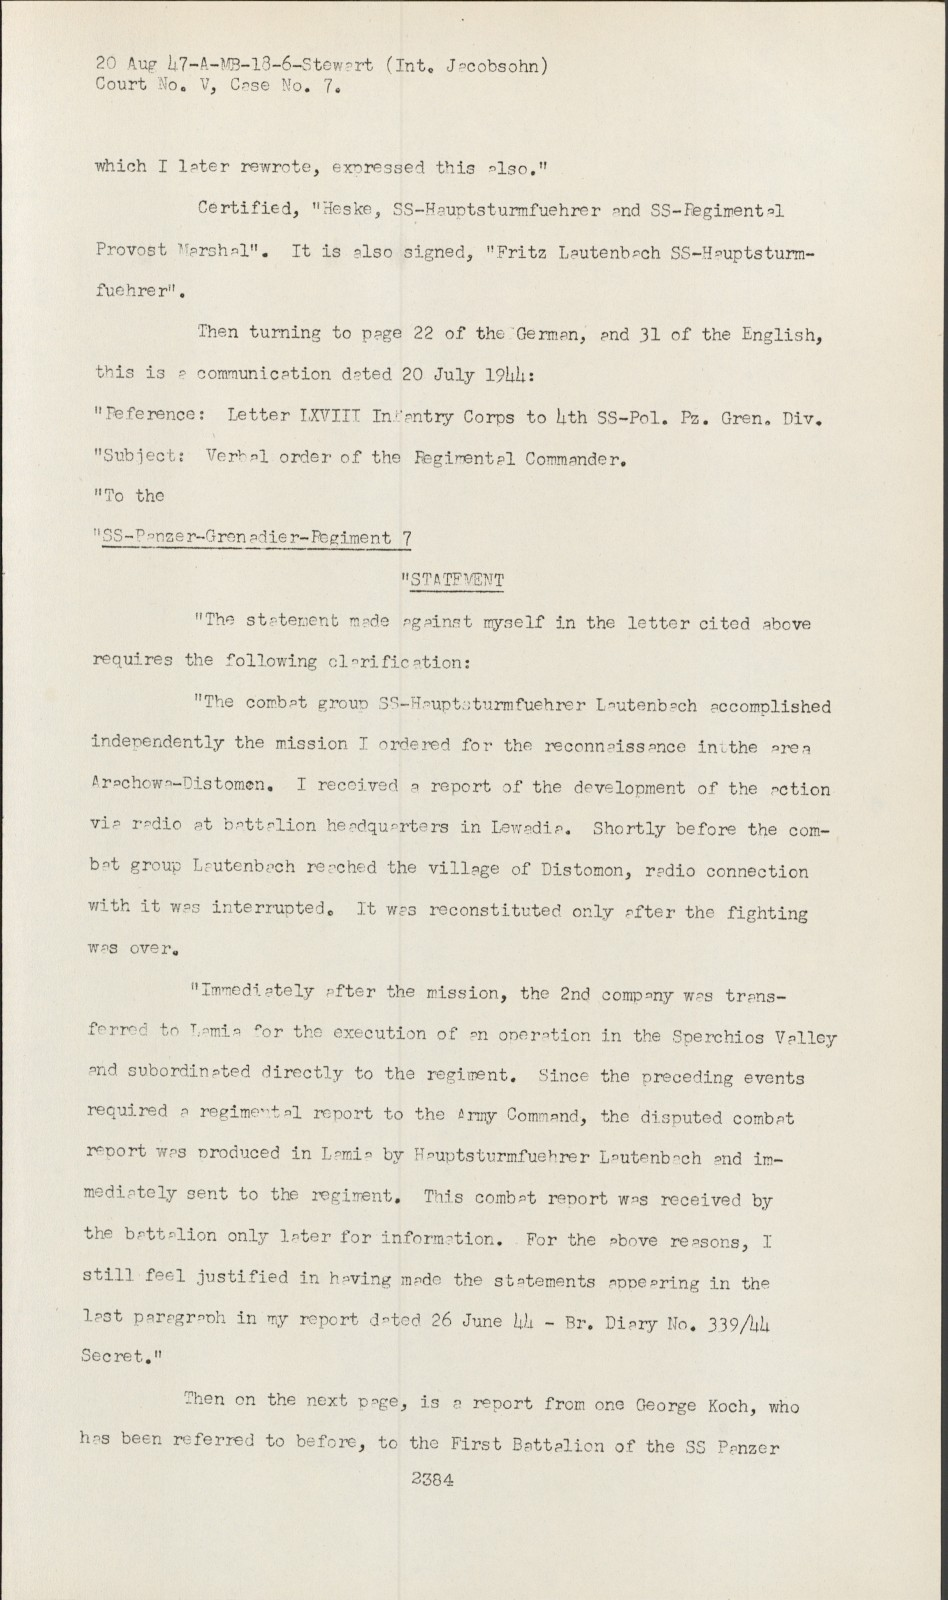 Nuremberg - Transcript Viewer - Transcript for NMT 7: Hostage Case